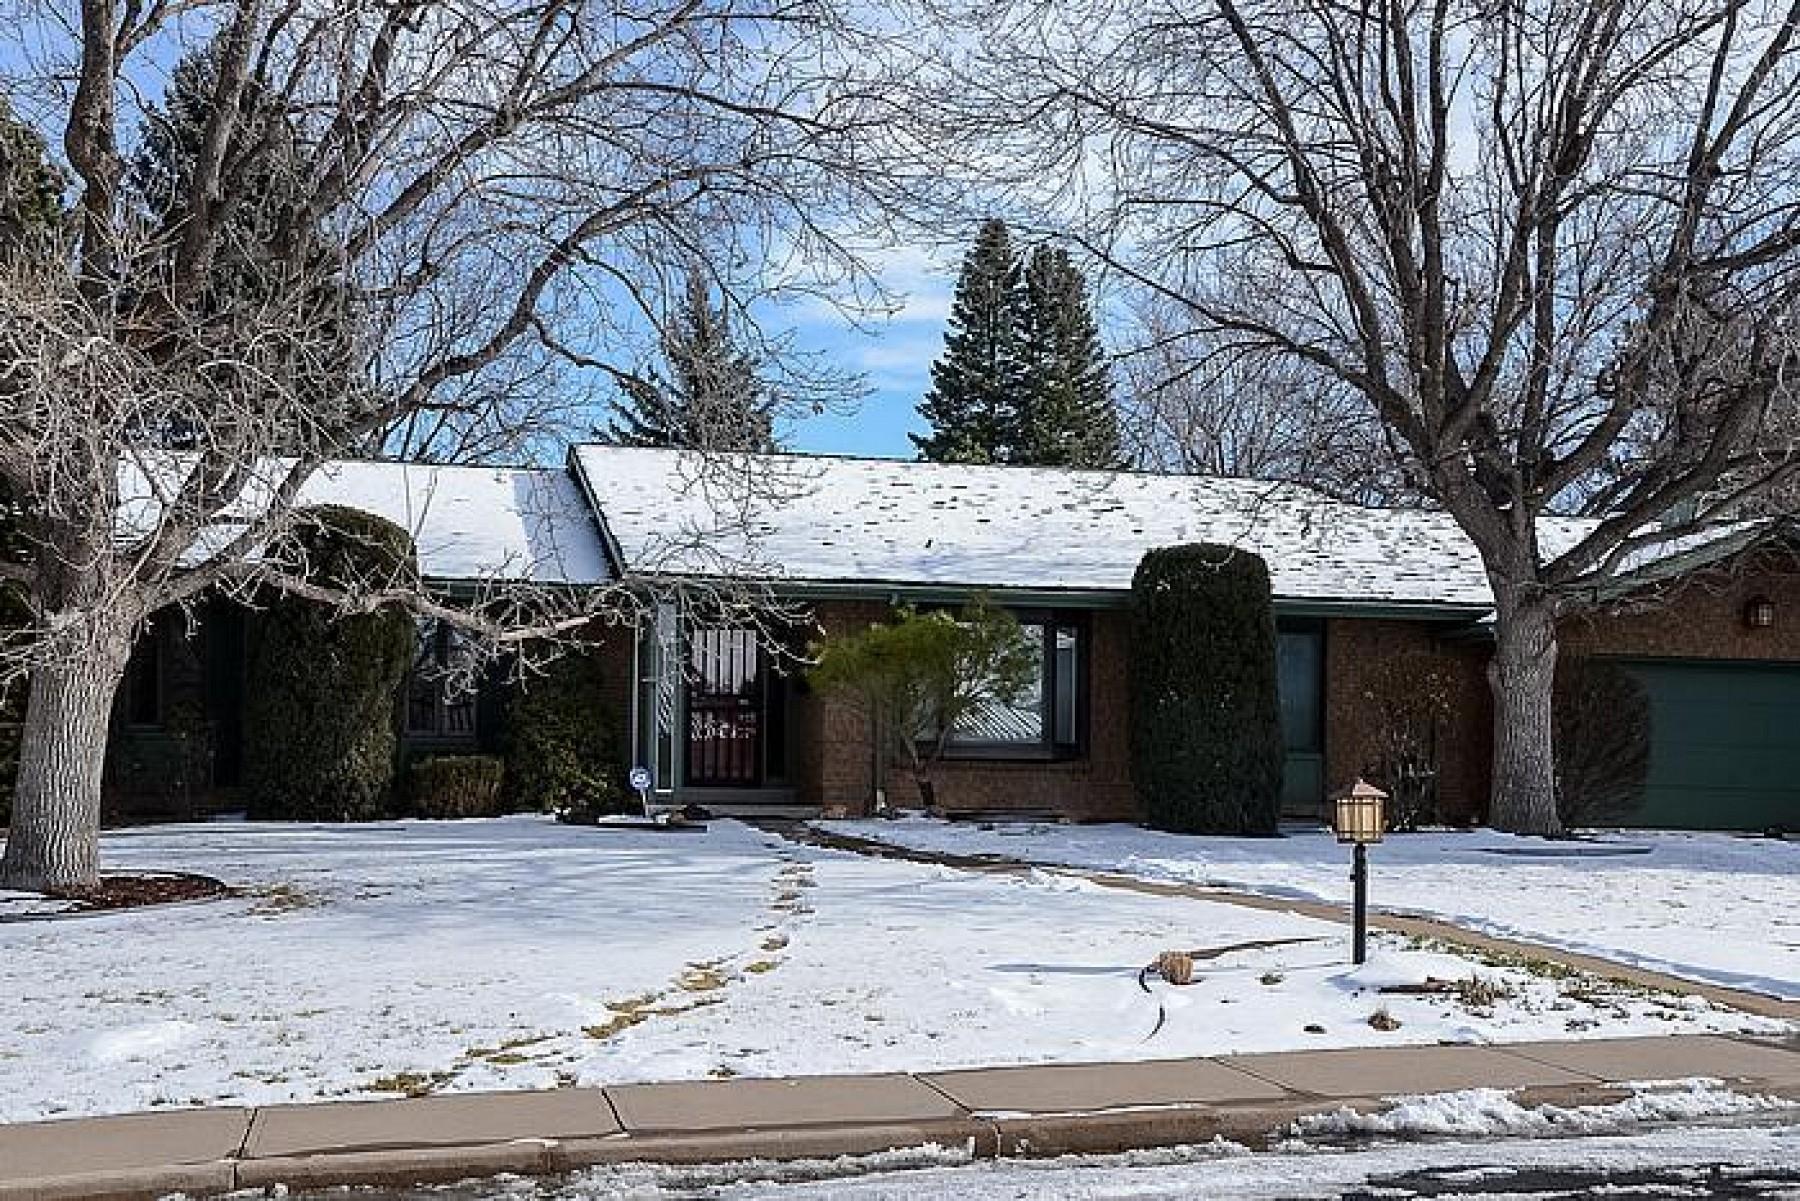 4122 S. Zenobia Street, Denver, CO 80236